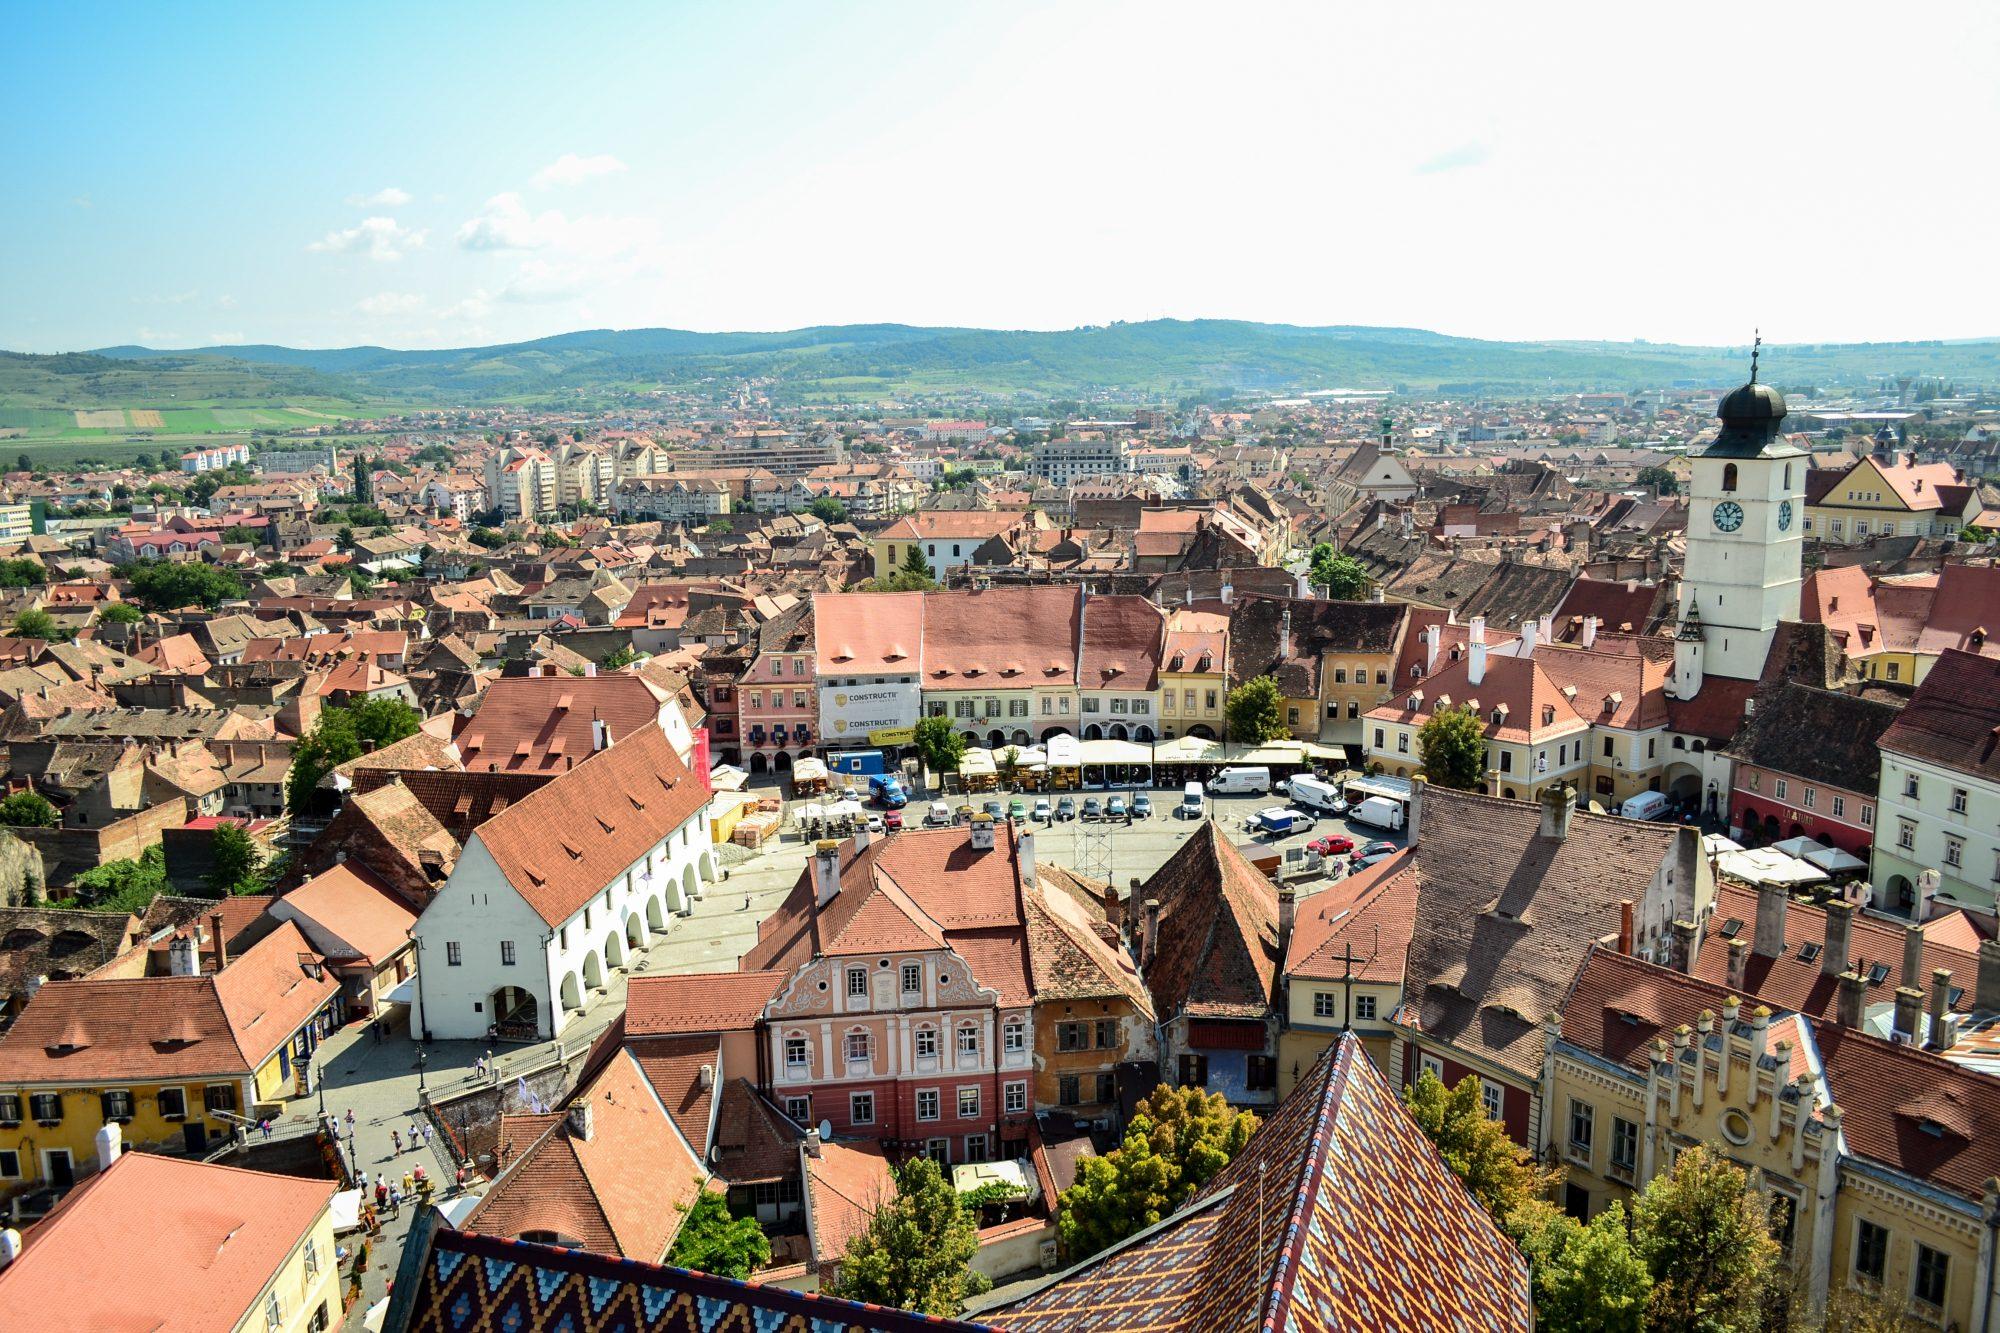 https://newinbw.de/wp-content/uploads/2018/02/Romania-Sibiu-e1518018484568.jpg